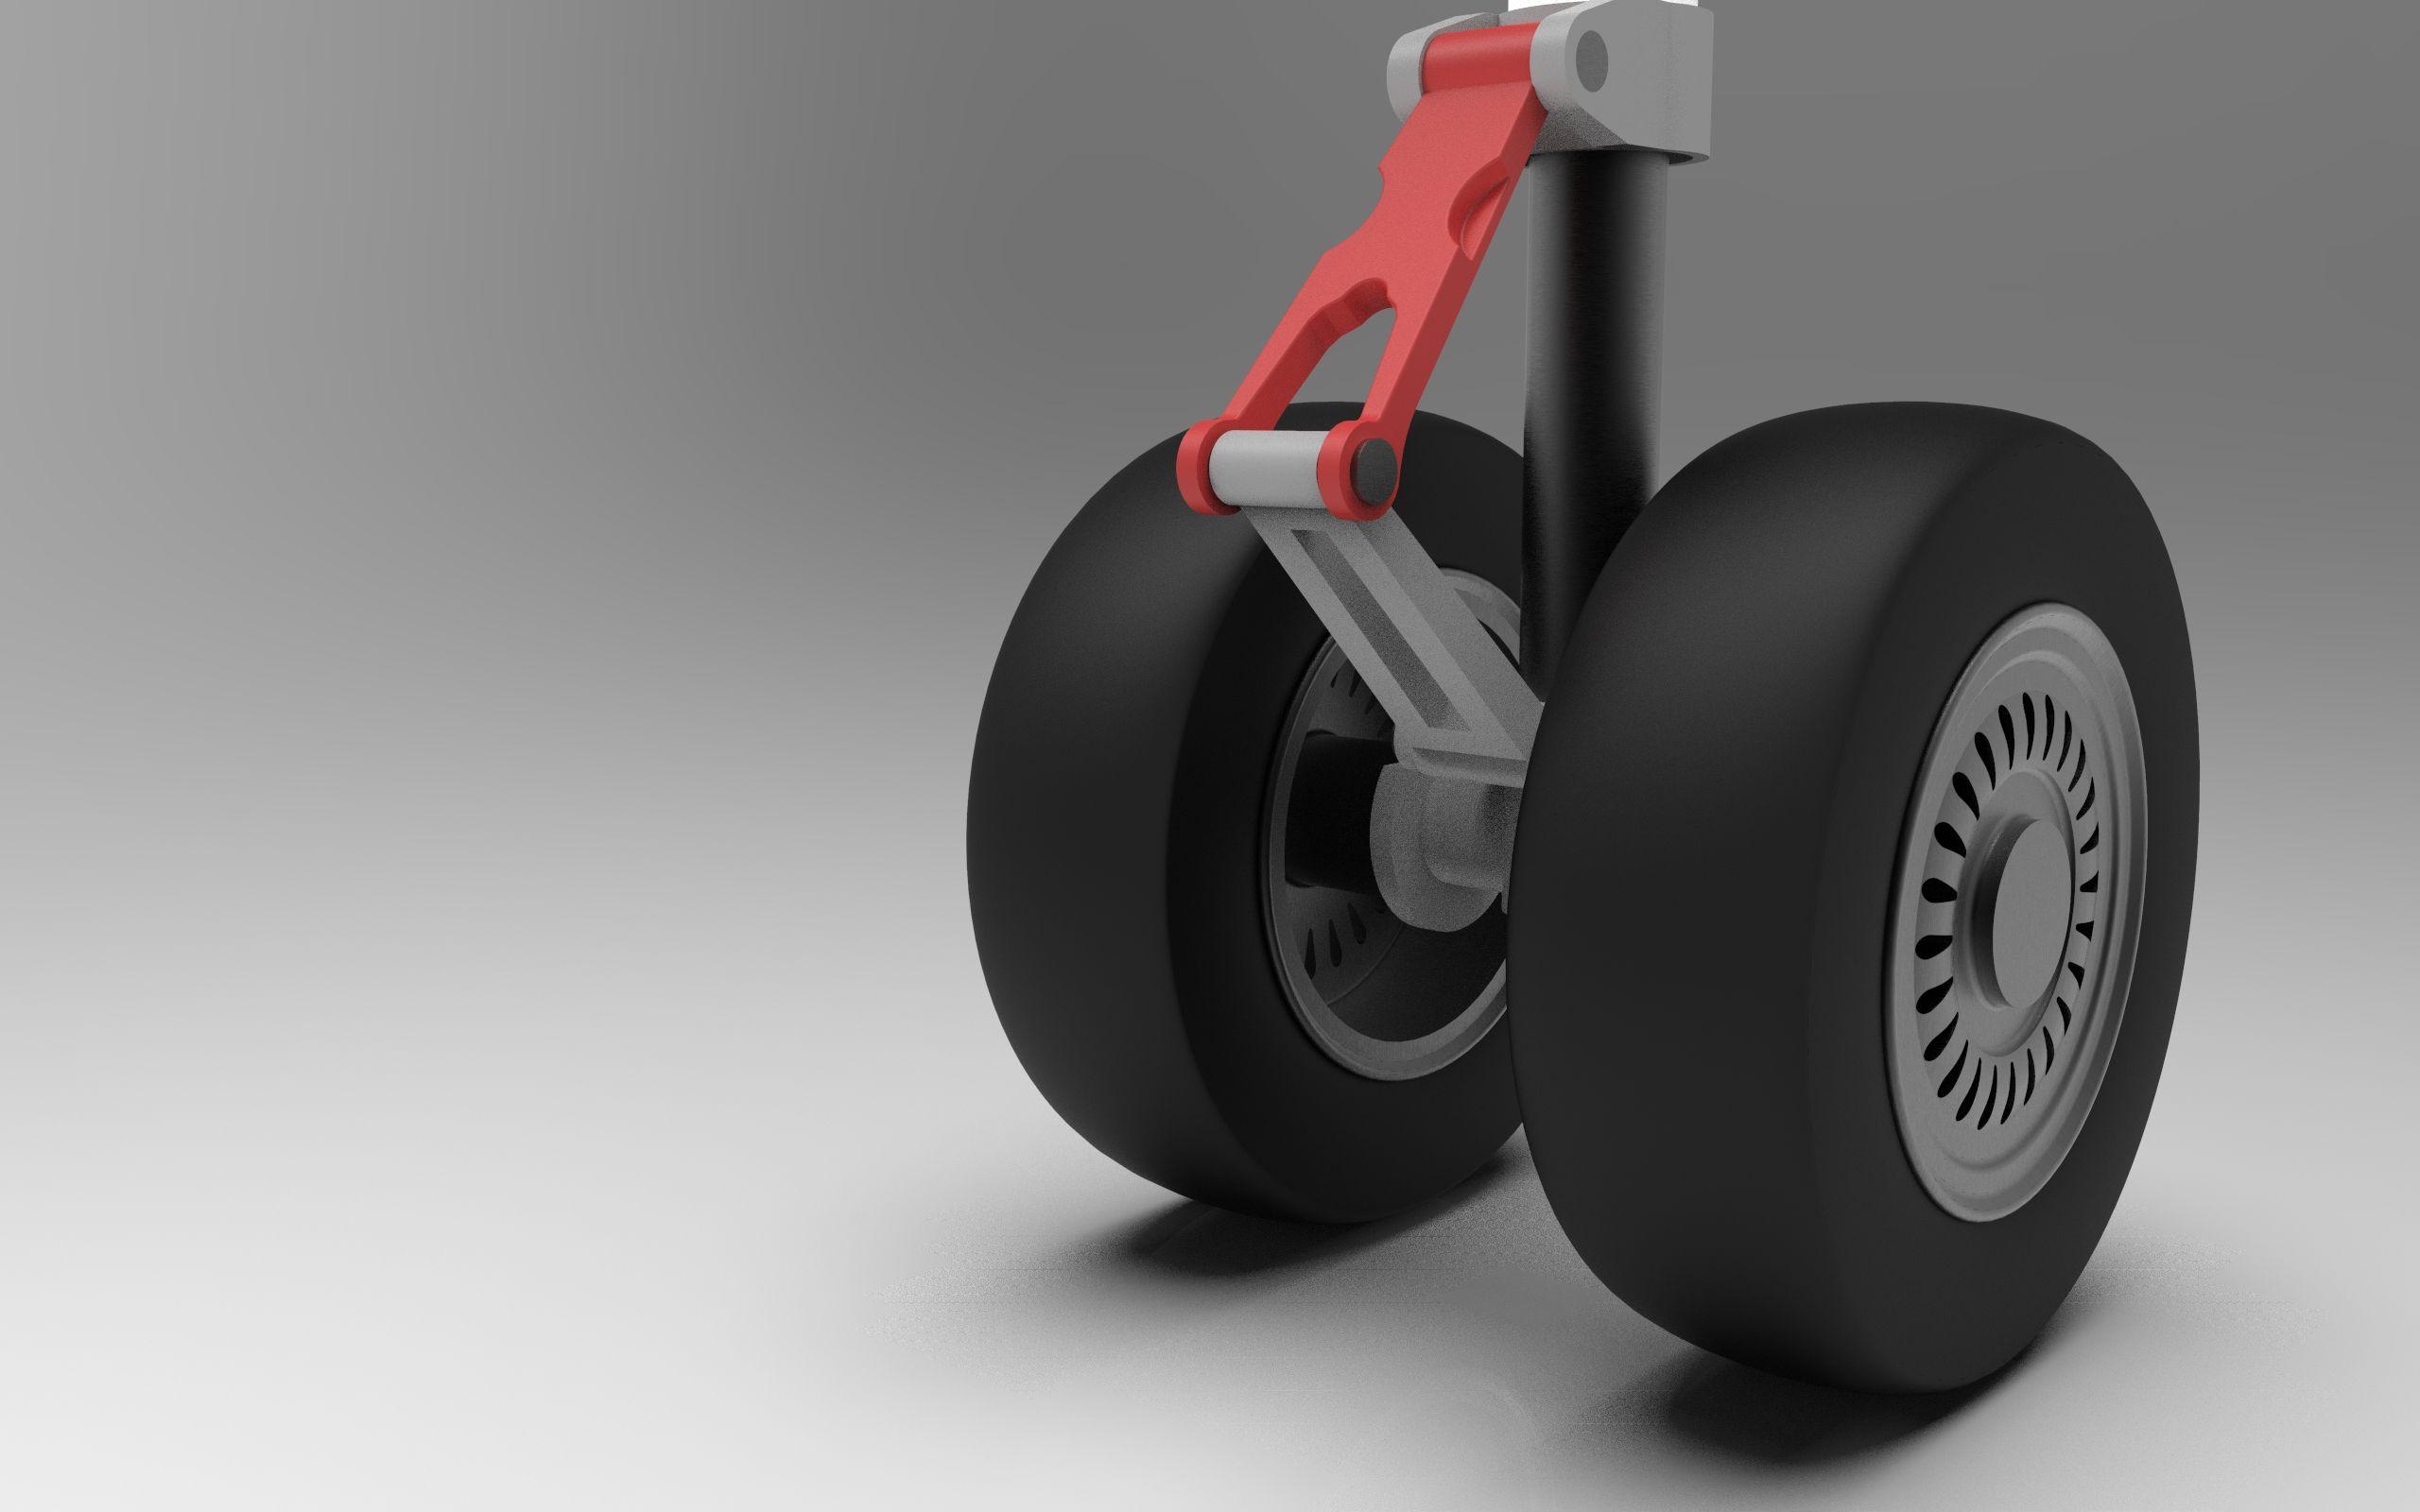 Aerodesign-550423-3500-3500